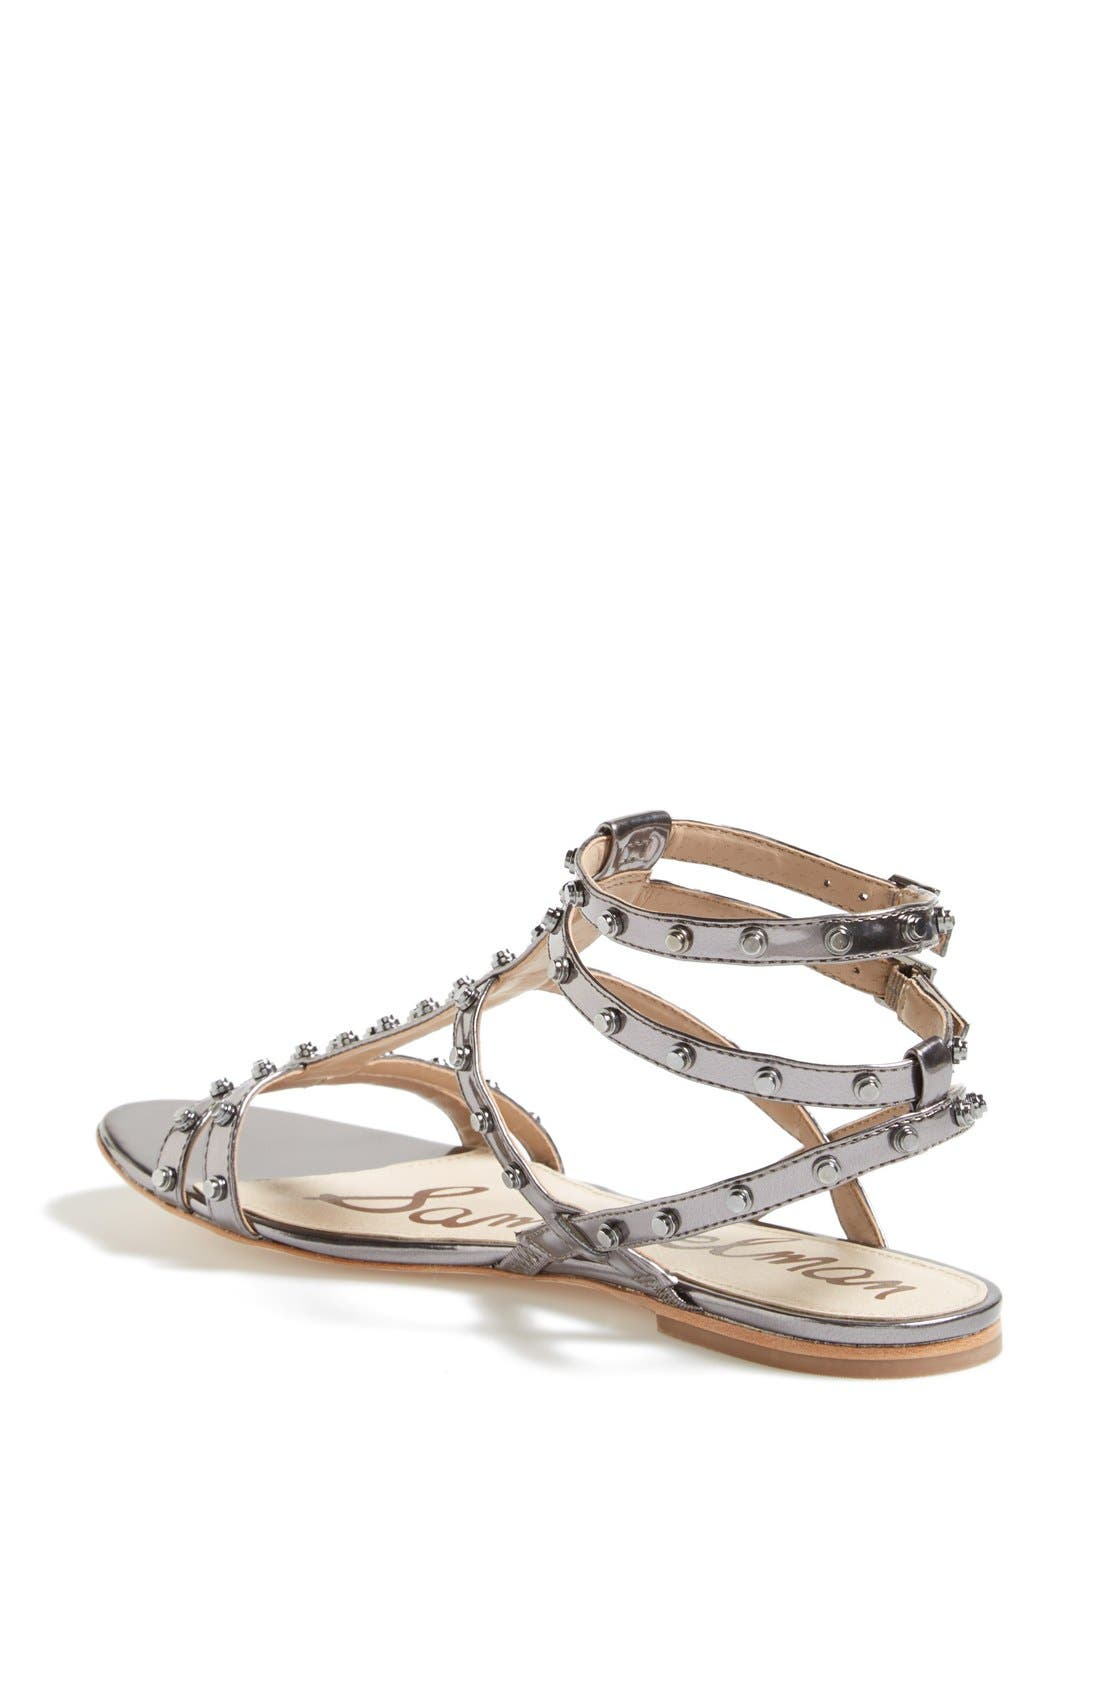 Alternate Image 2  - Sam Edelman 'Berkeley' Sandal (Nordstrom Exclusive)